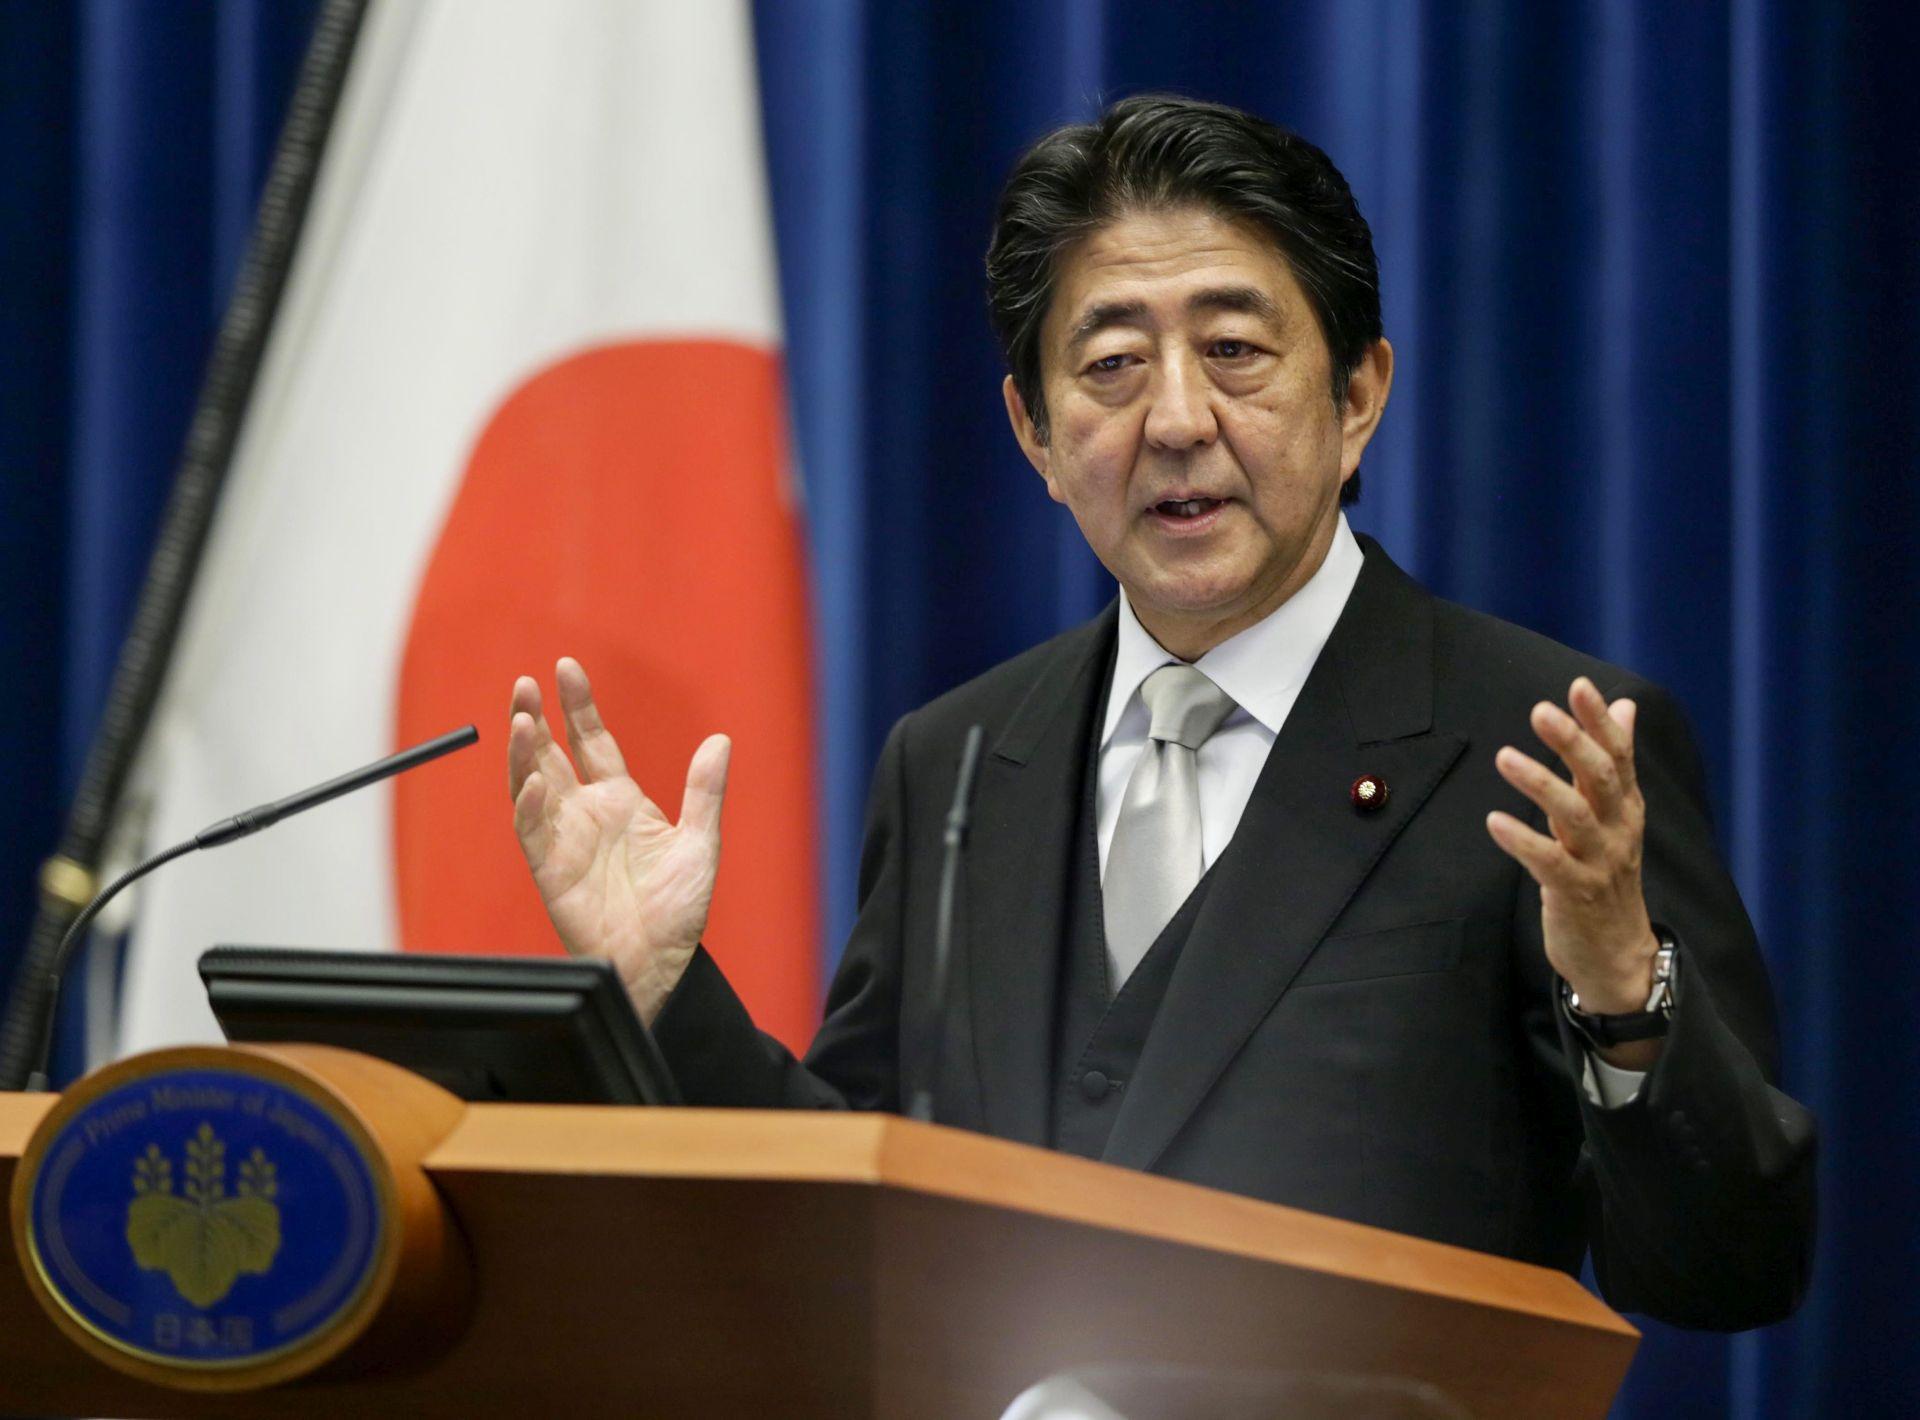 JAPAN Sigurnost i trgovina na dnevnom redu Abeove turneje po Europi